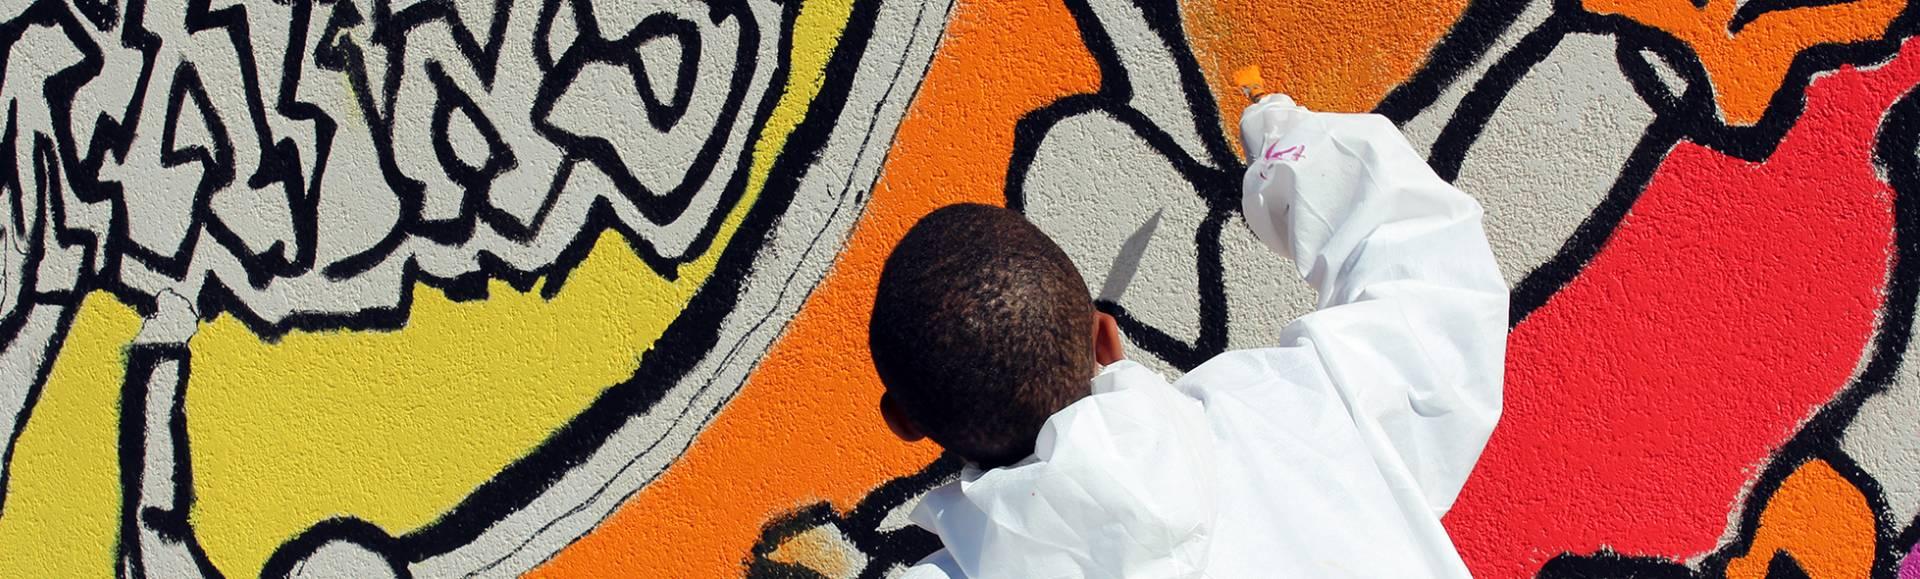 graffeur-street-art-blanc-jaune-rouge-noir.jpg